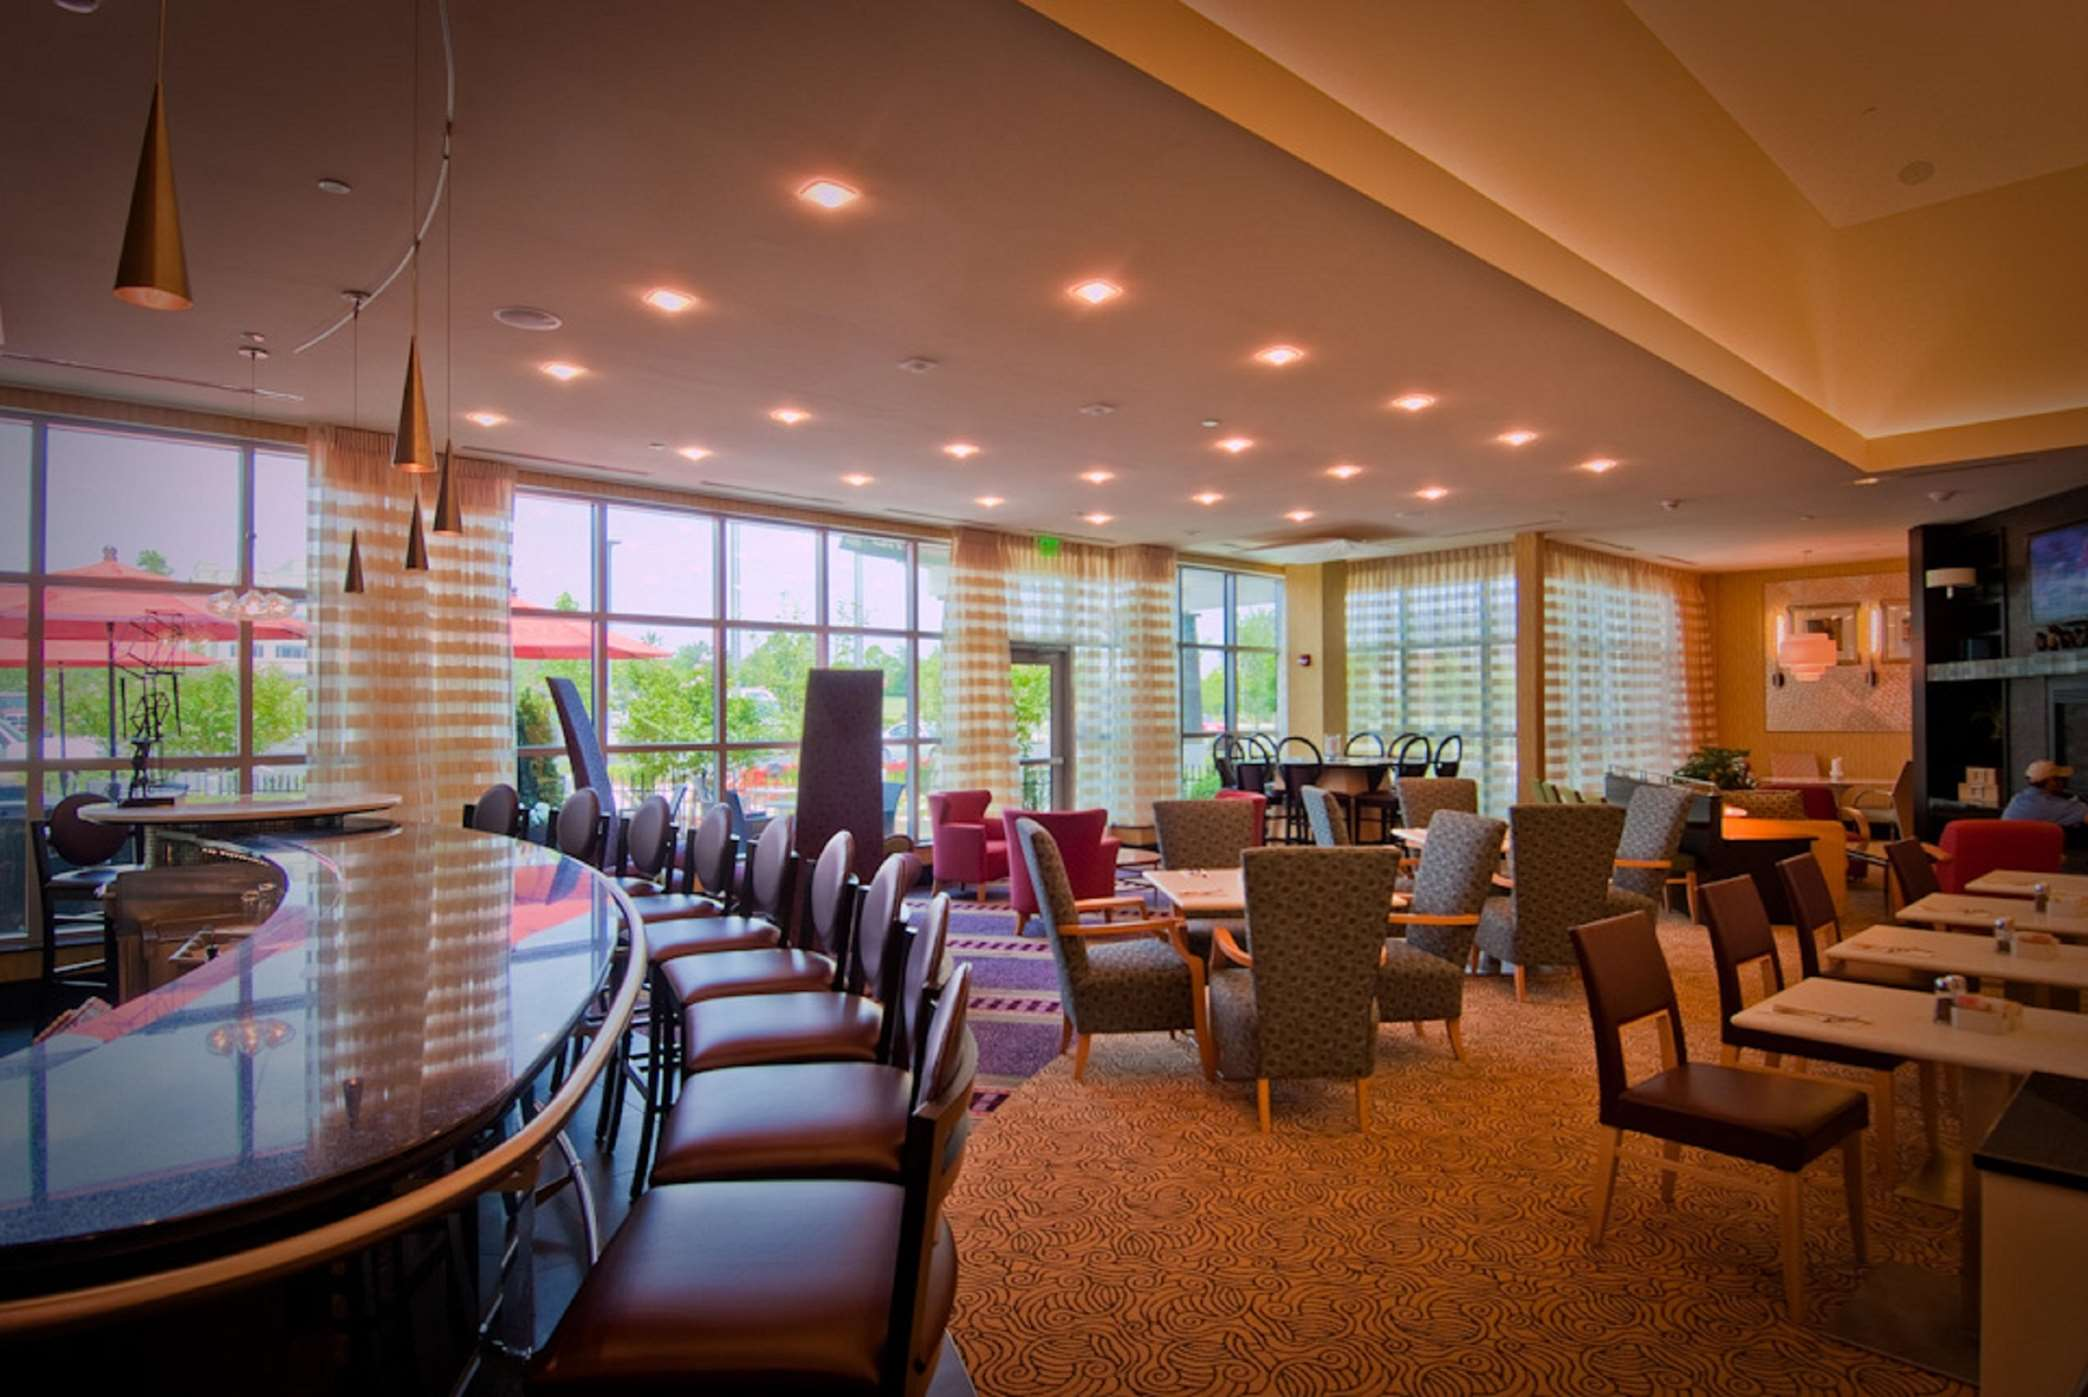 Hilton Garden Inn Rockville-Gaithersburg image 4